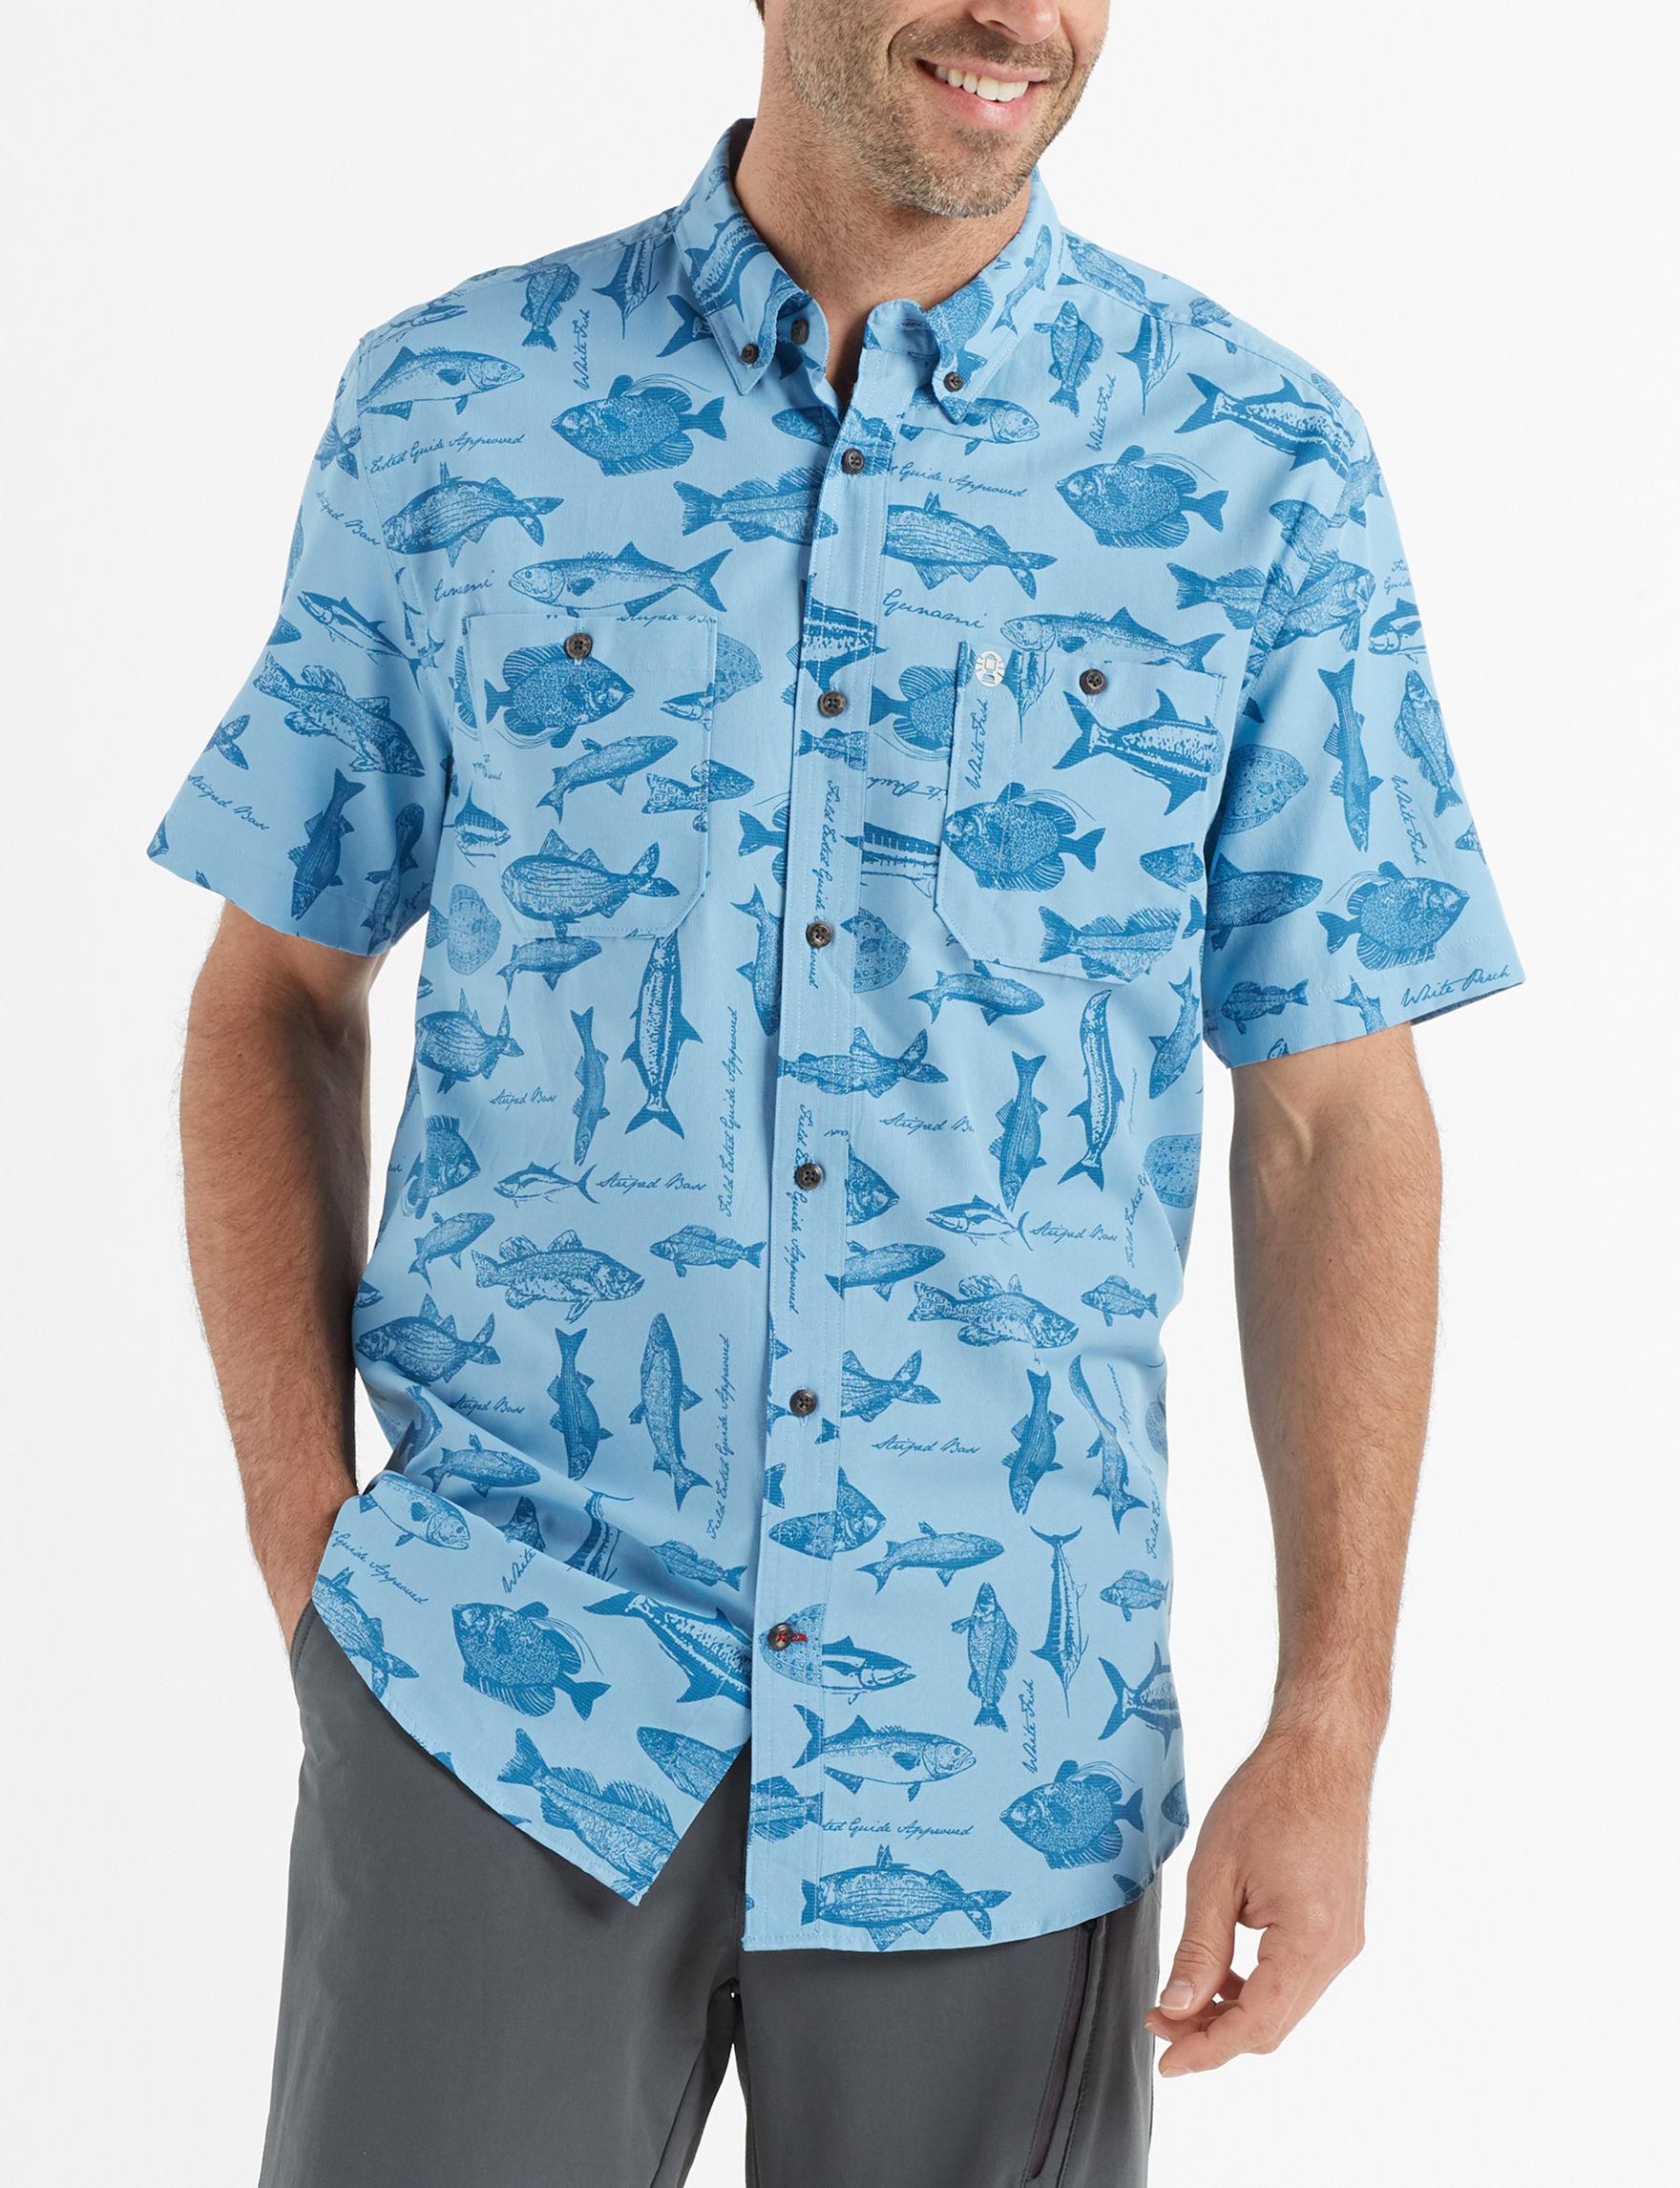 Coleman Blue / Blue Casual Button Down Shirts